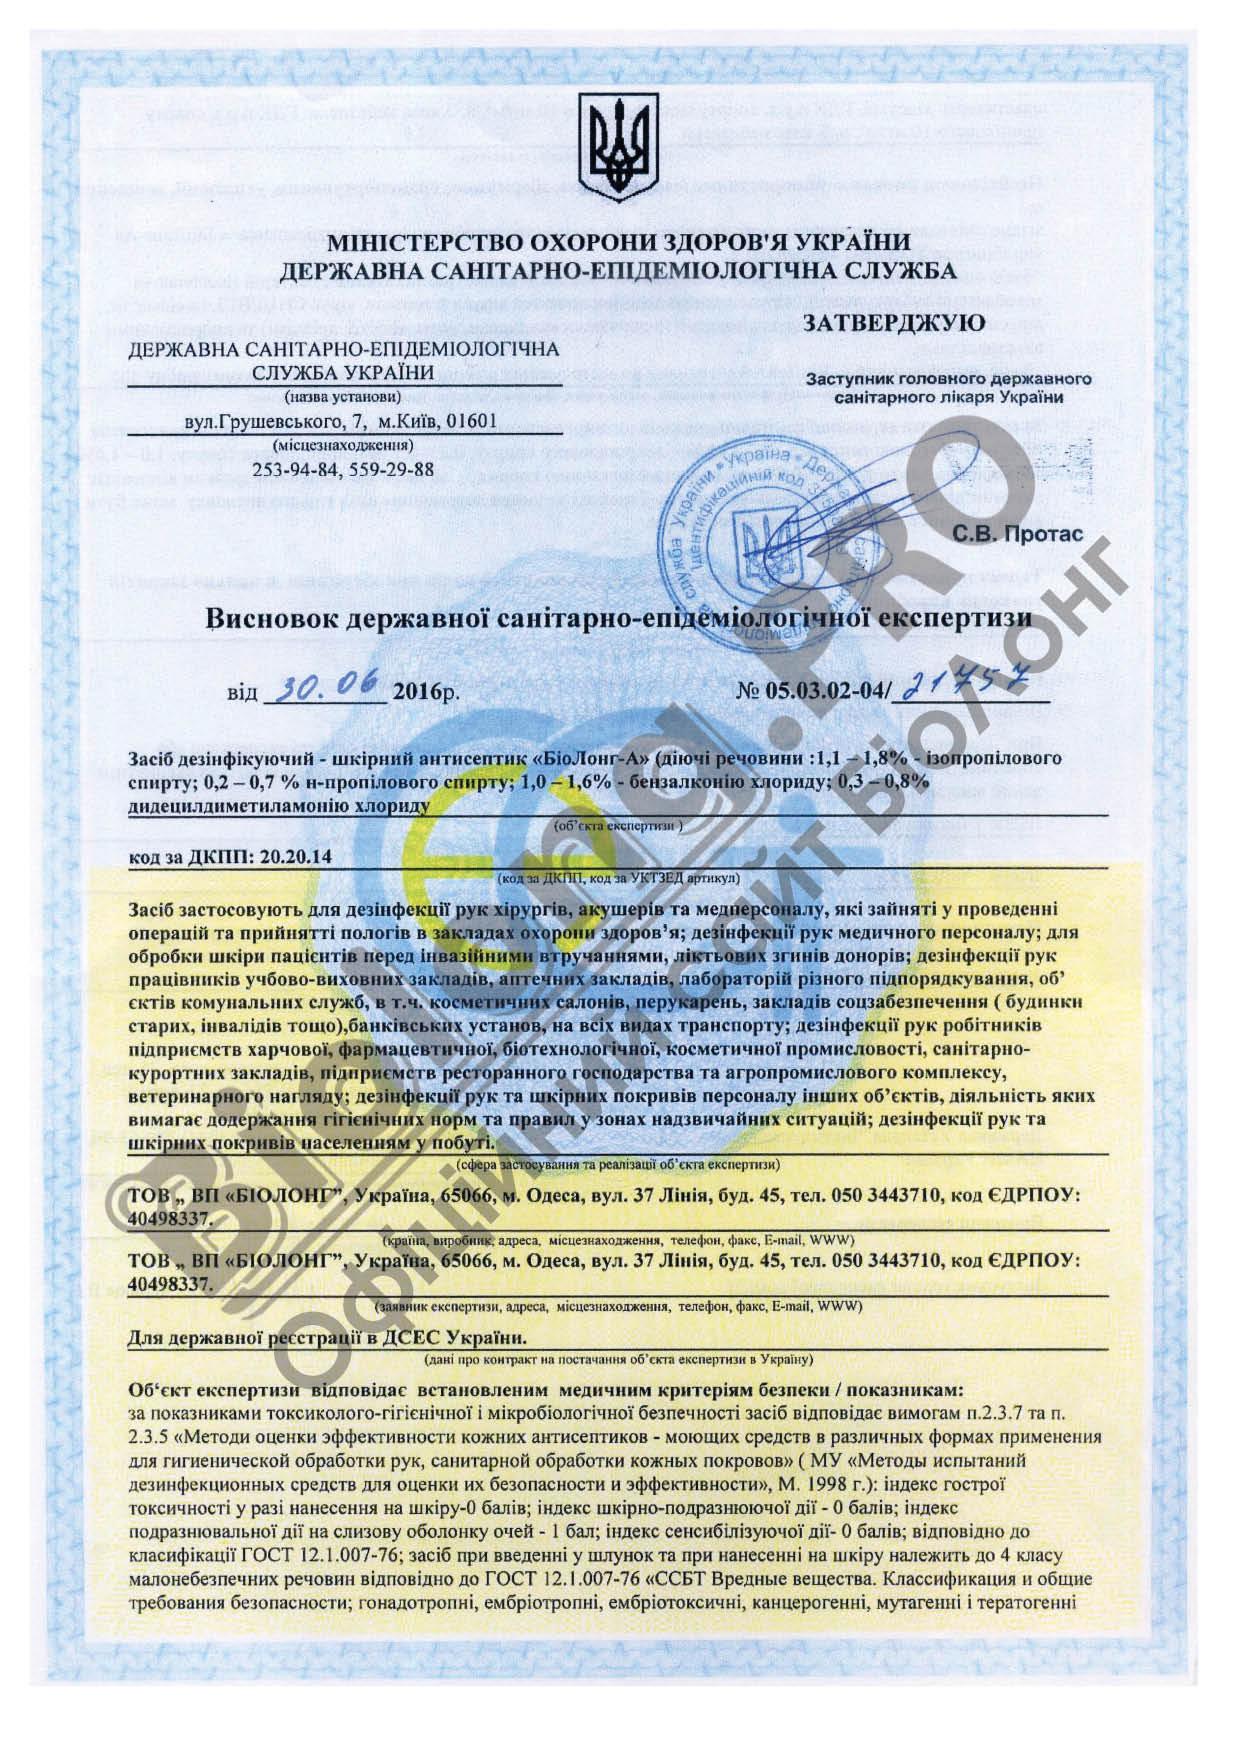 Сертификат СЕС Биолонг